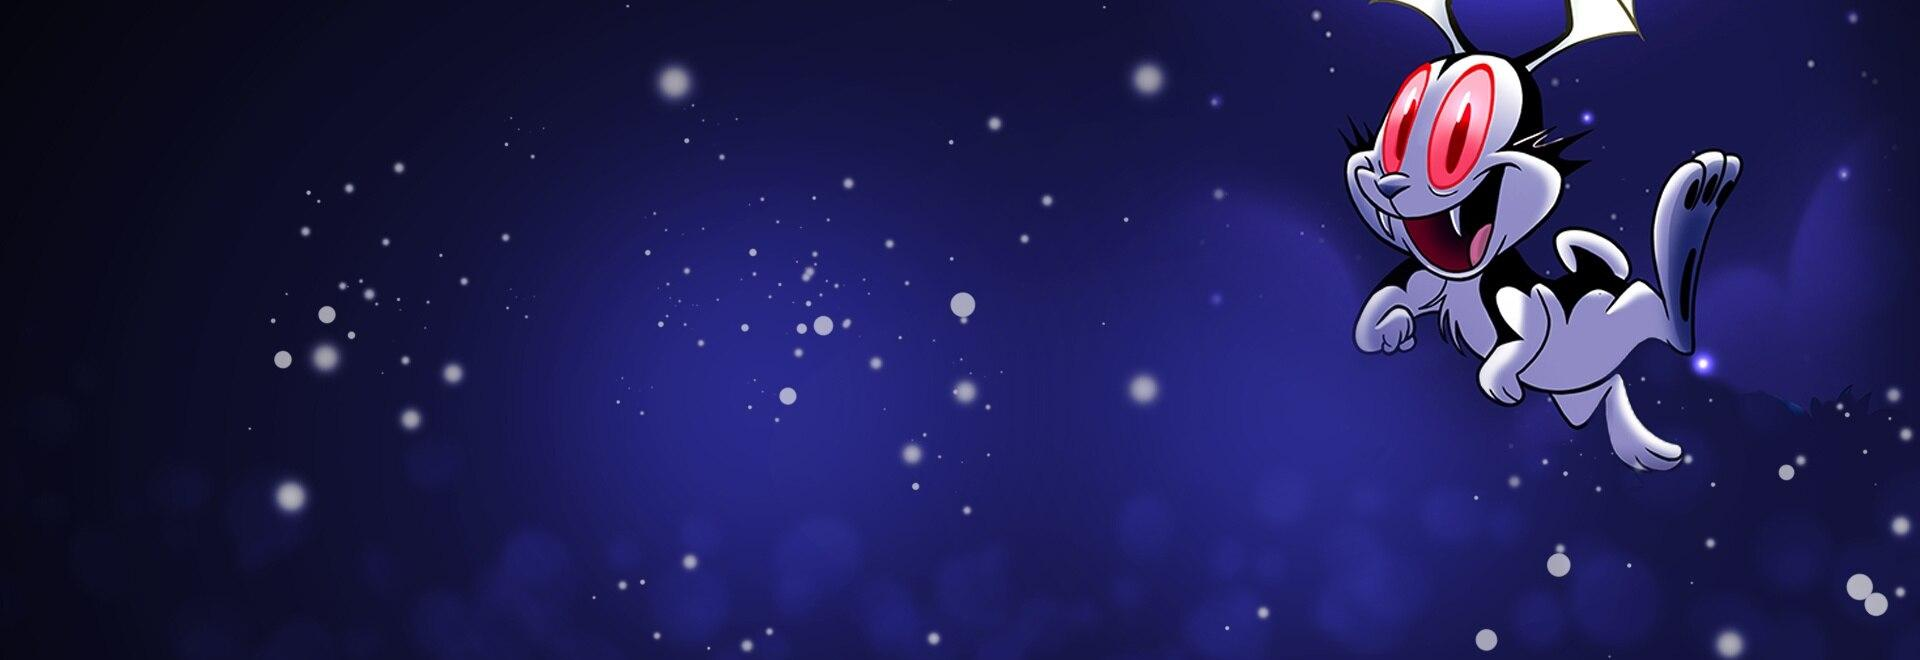 Tintarella di luna